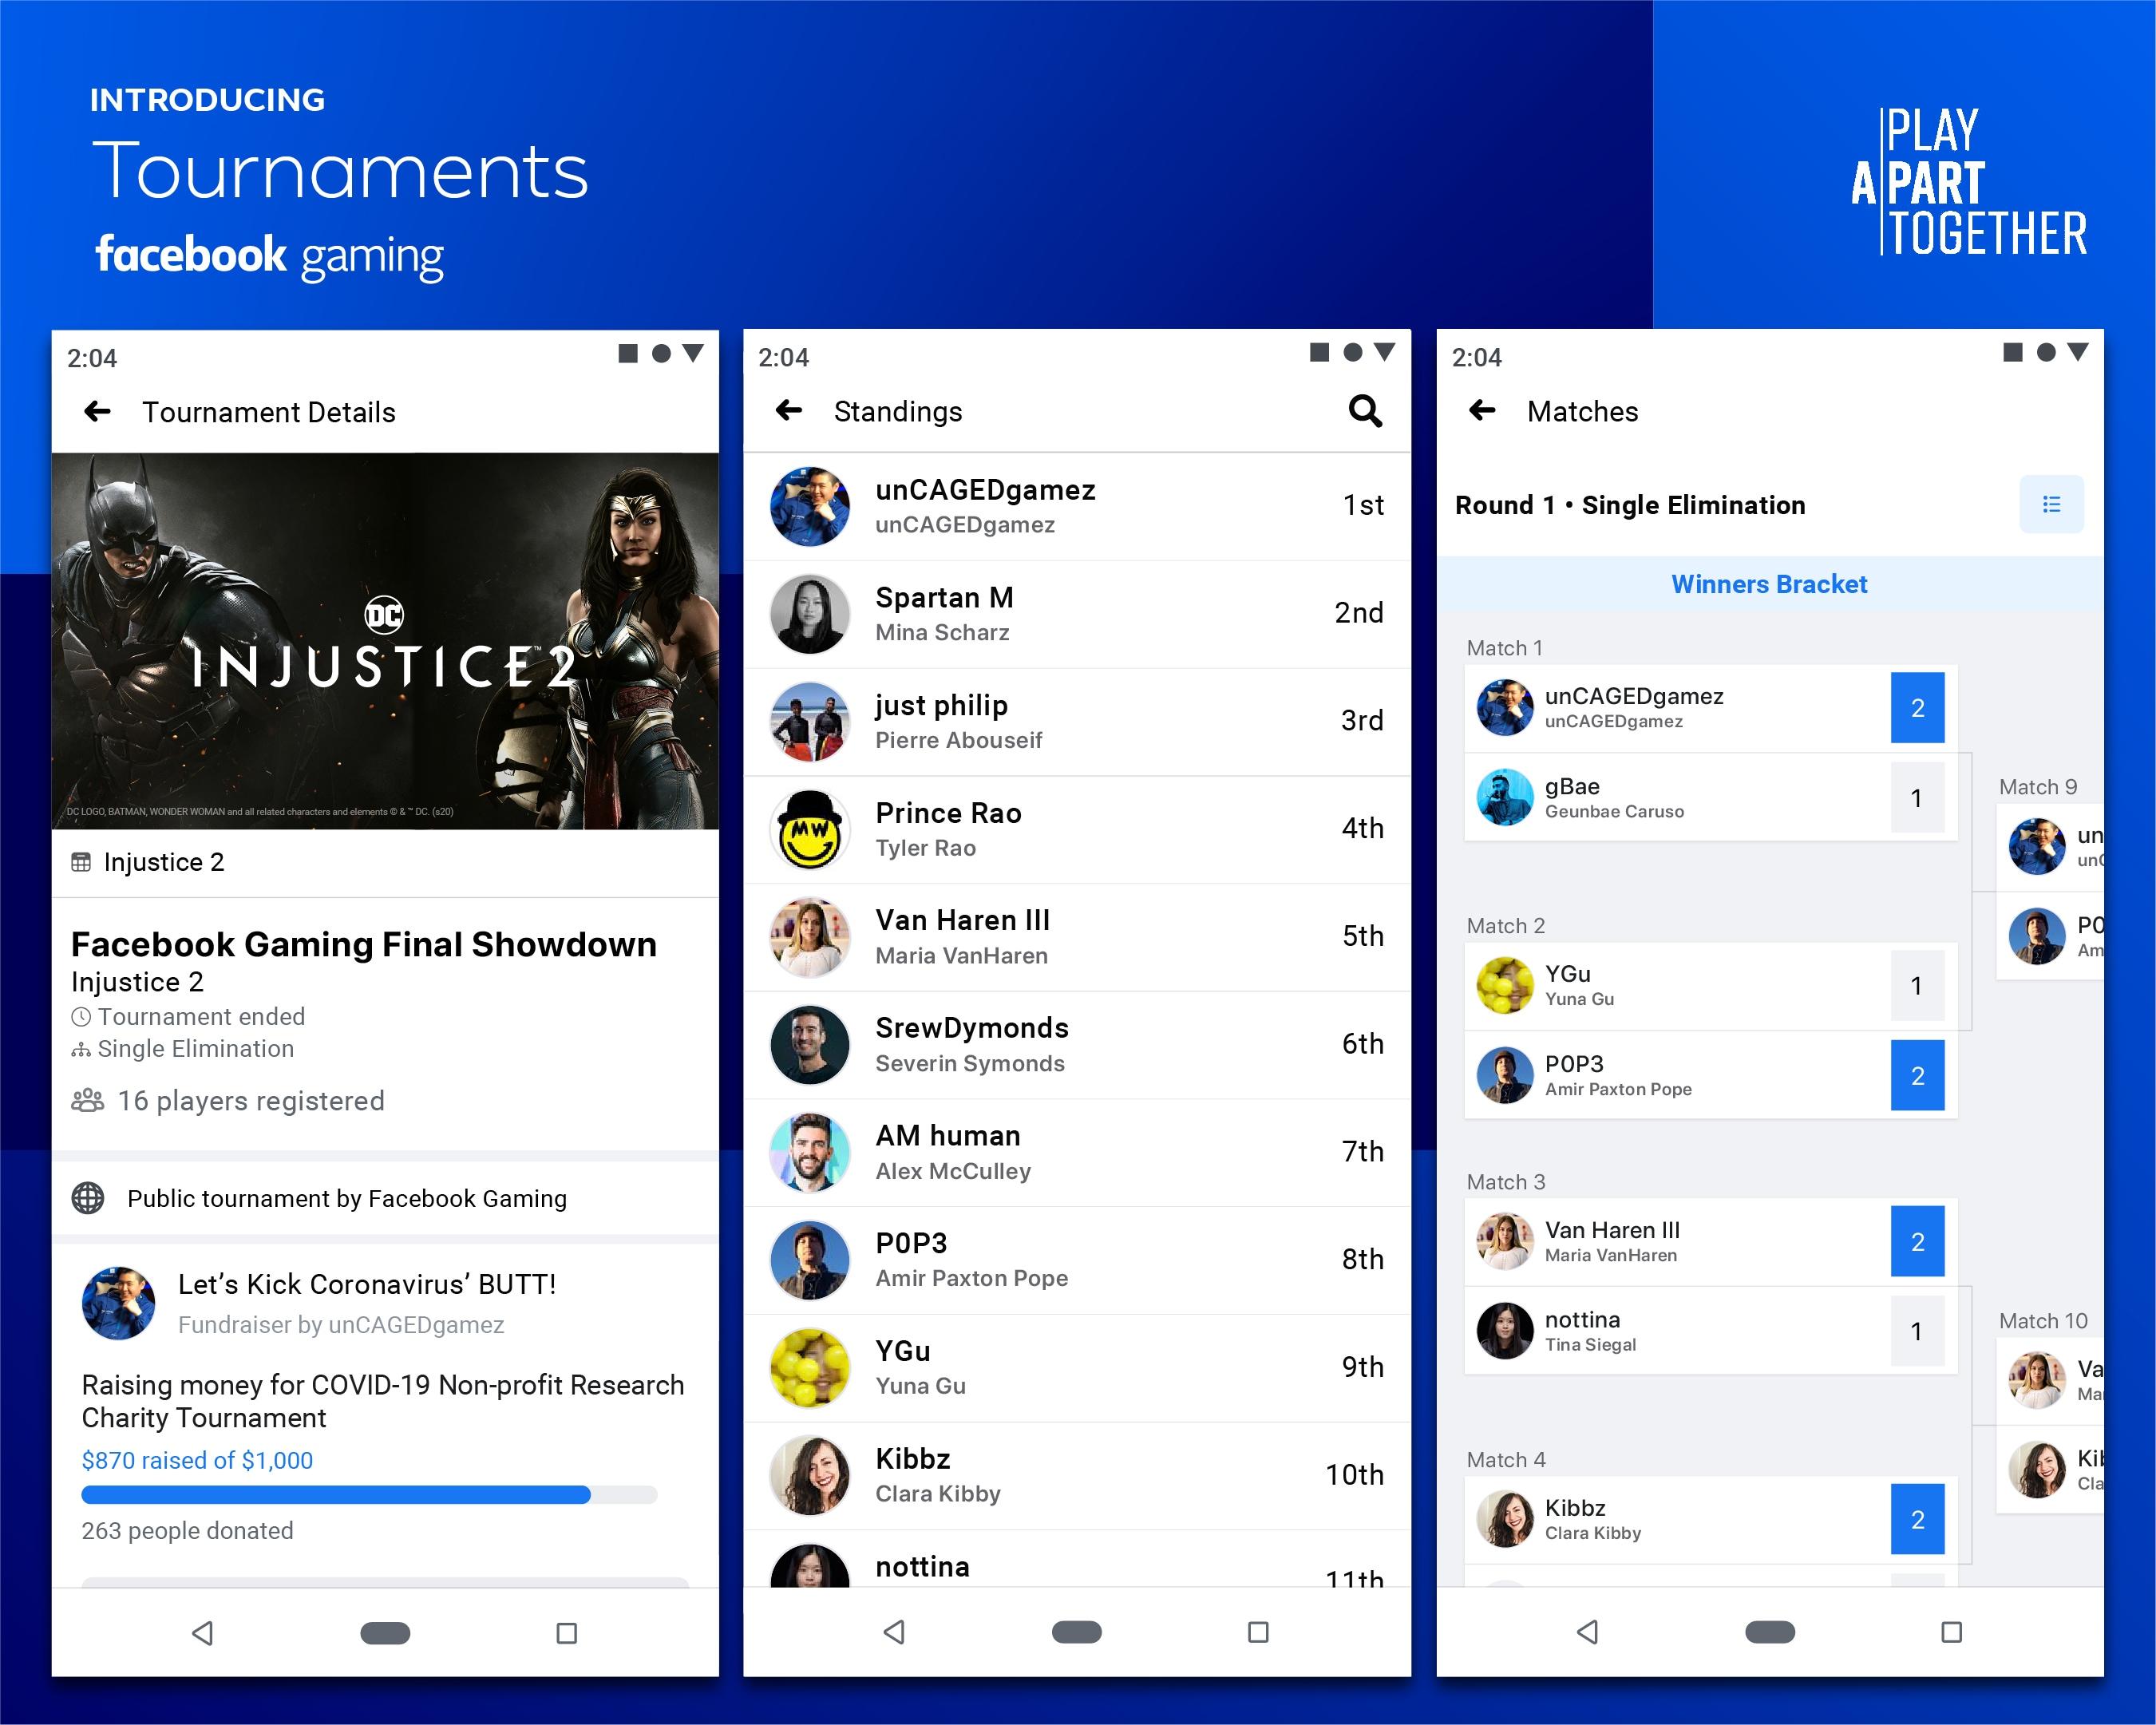 FB Gaming Tournaments_Mobile